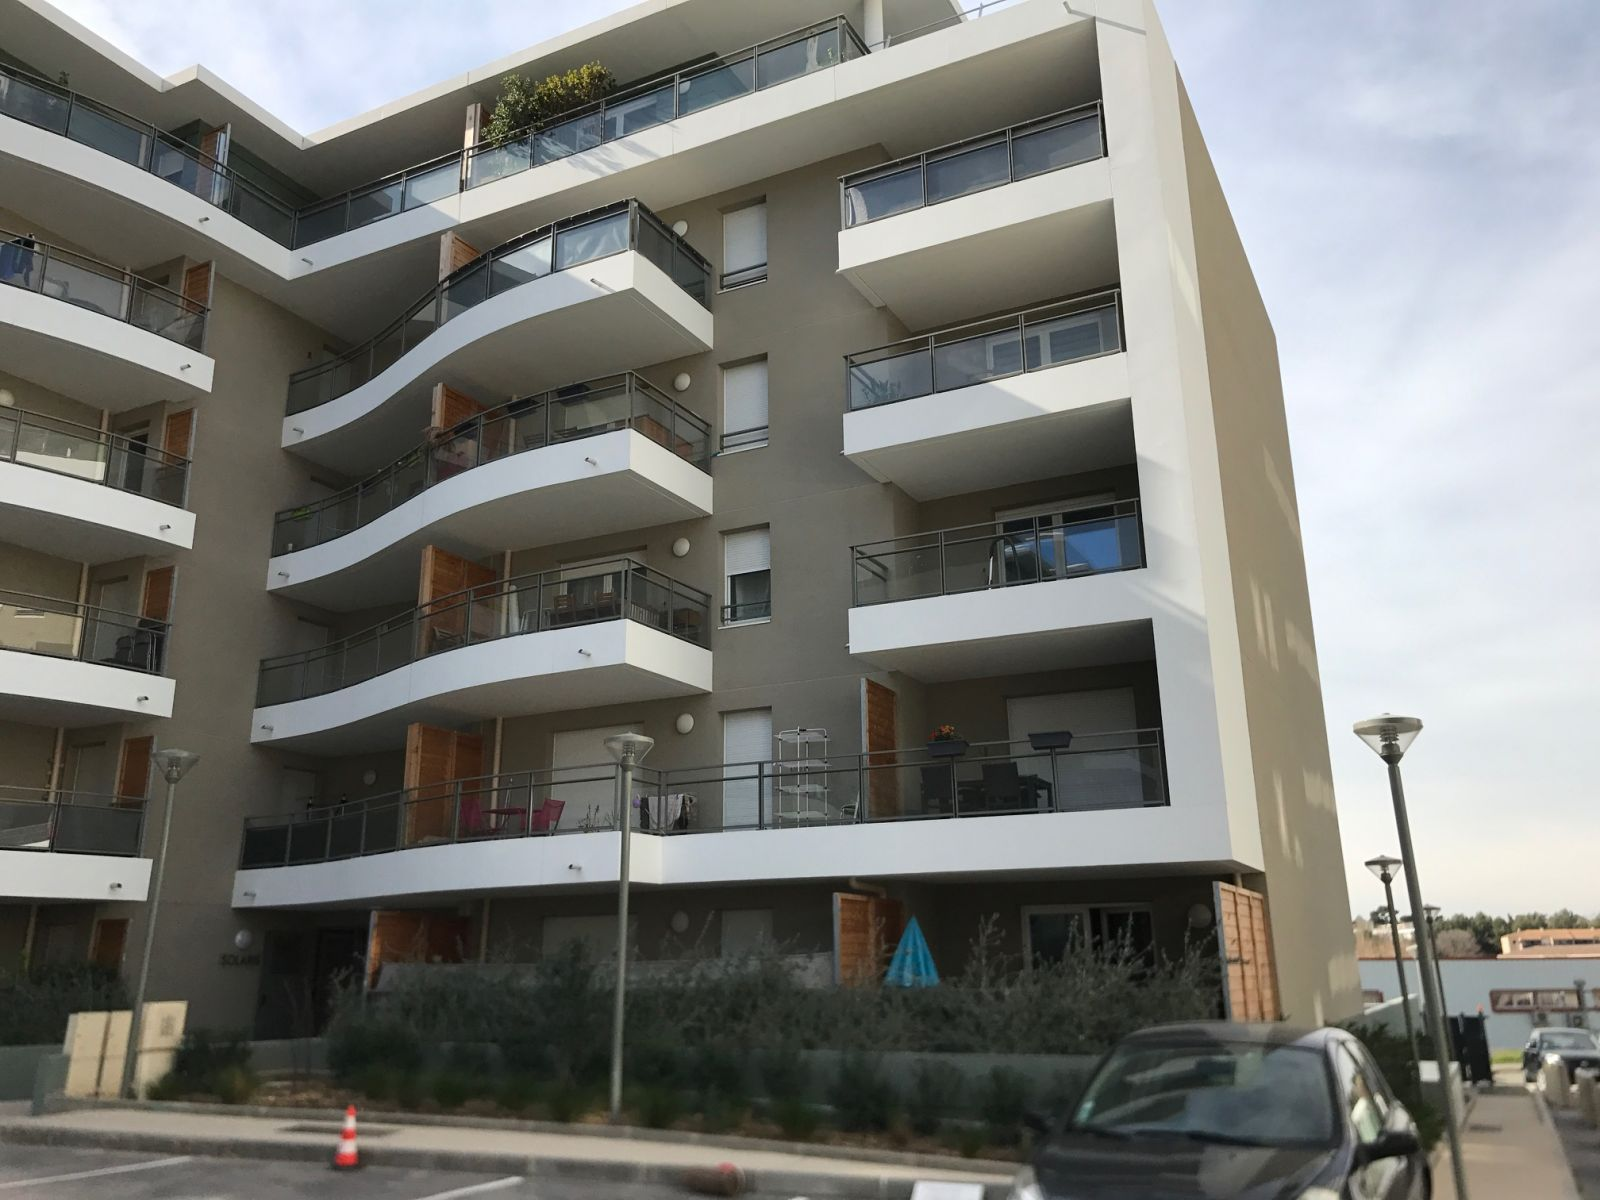 appartement t4 neuf avec grande terrasse marseille 12 les. Black Bedroom Furniture Sets. Home Design Ideas